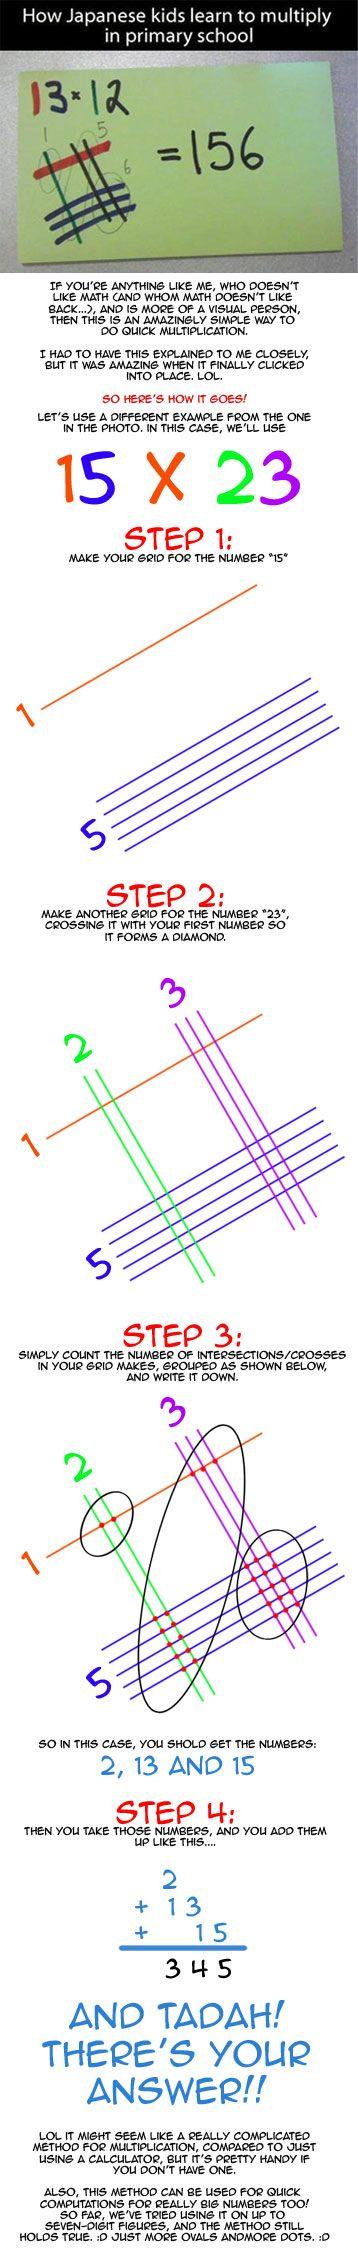 Multiplication japonaise: bluffant! 7ea9a2a977e1469d7dcce019f522f215